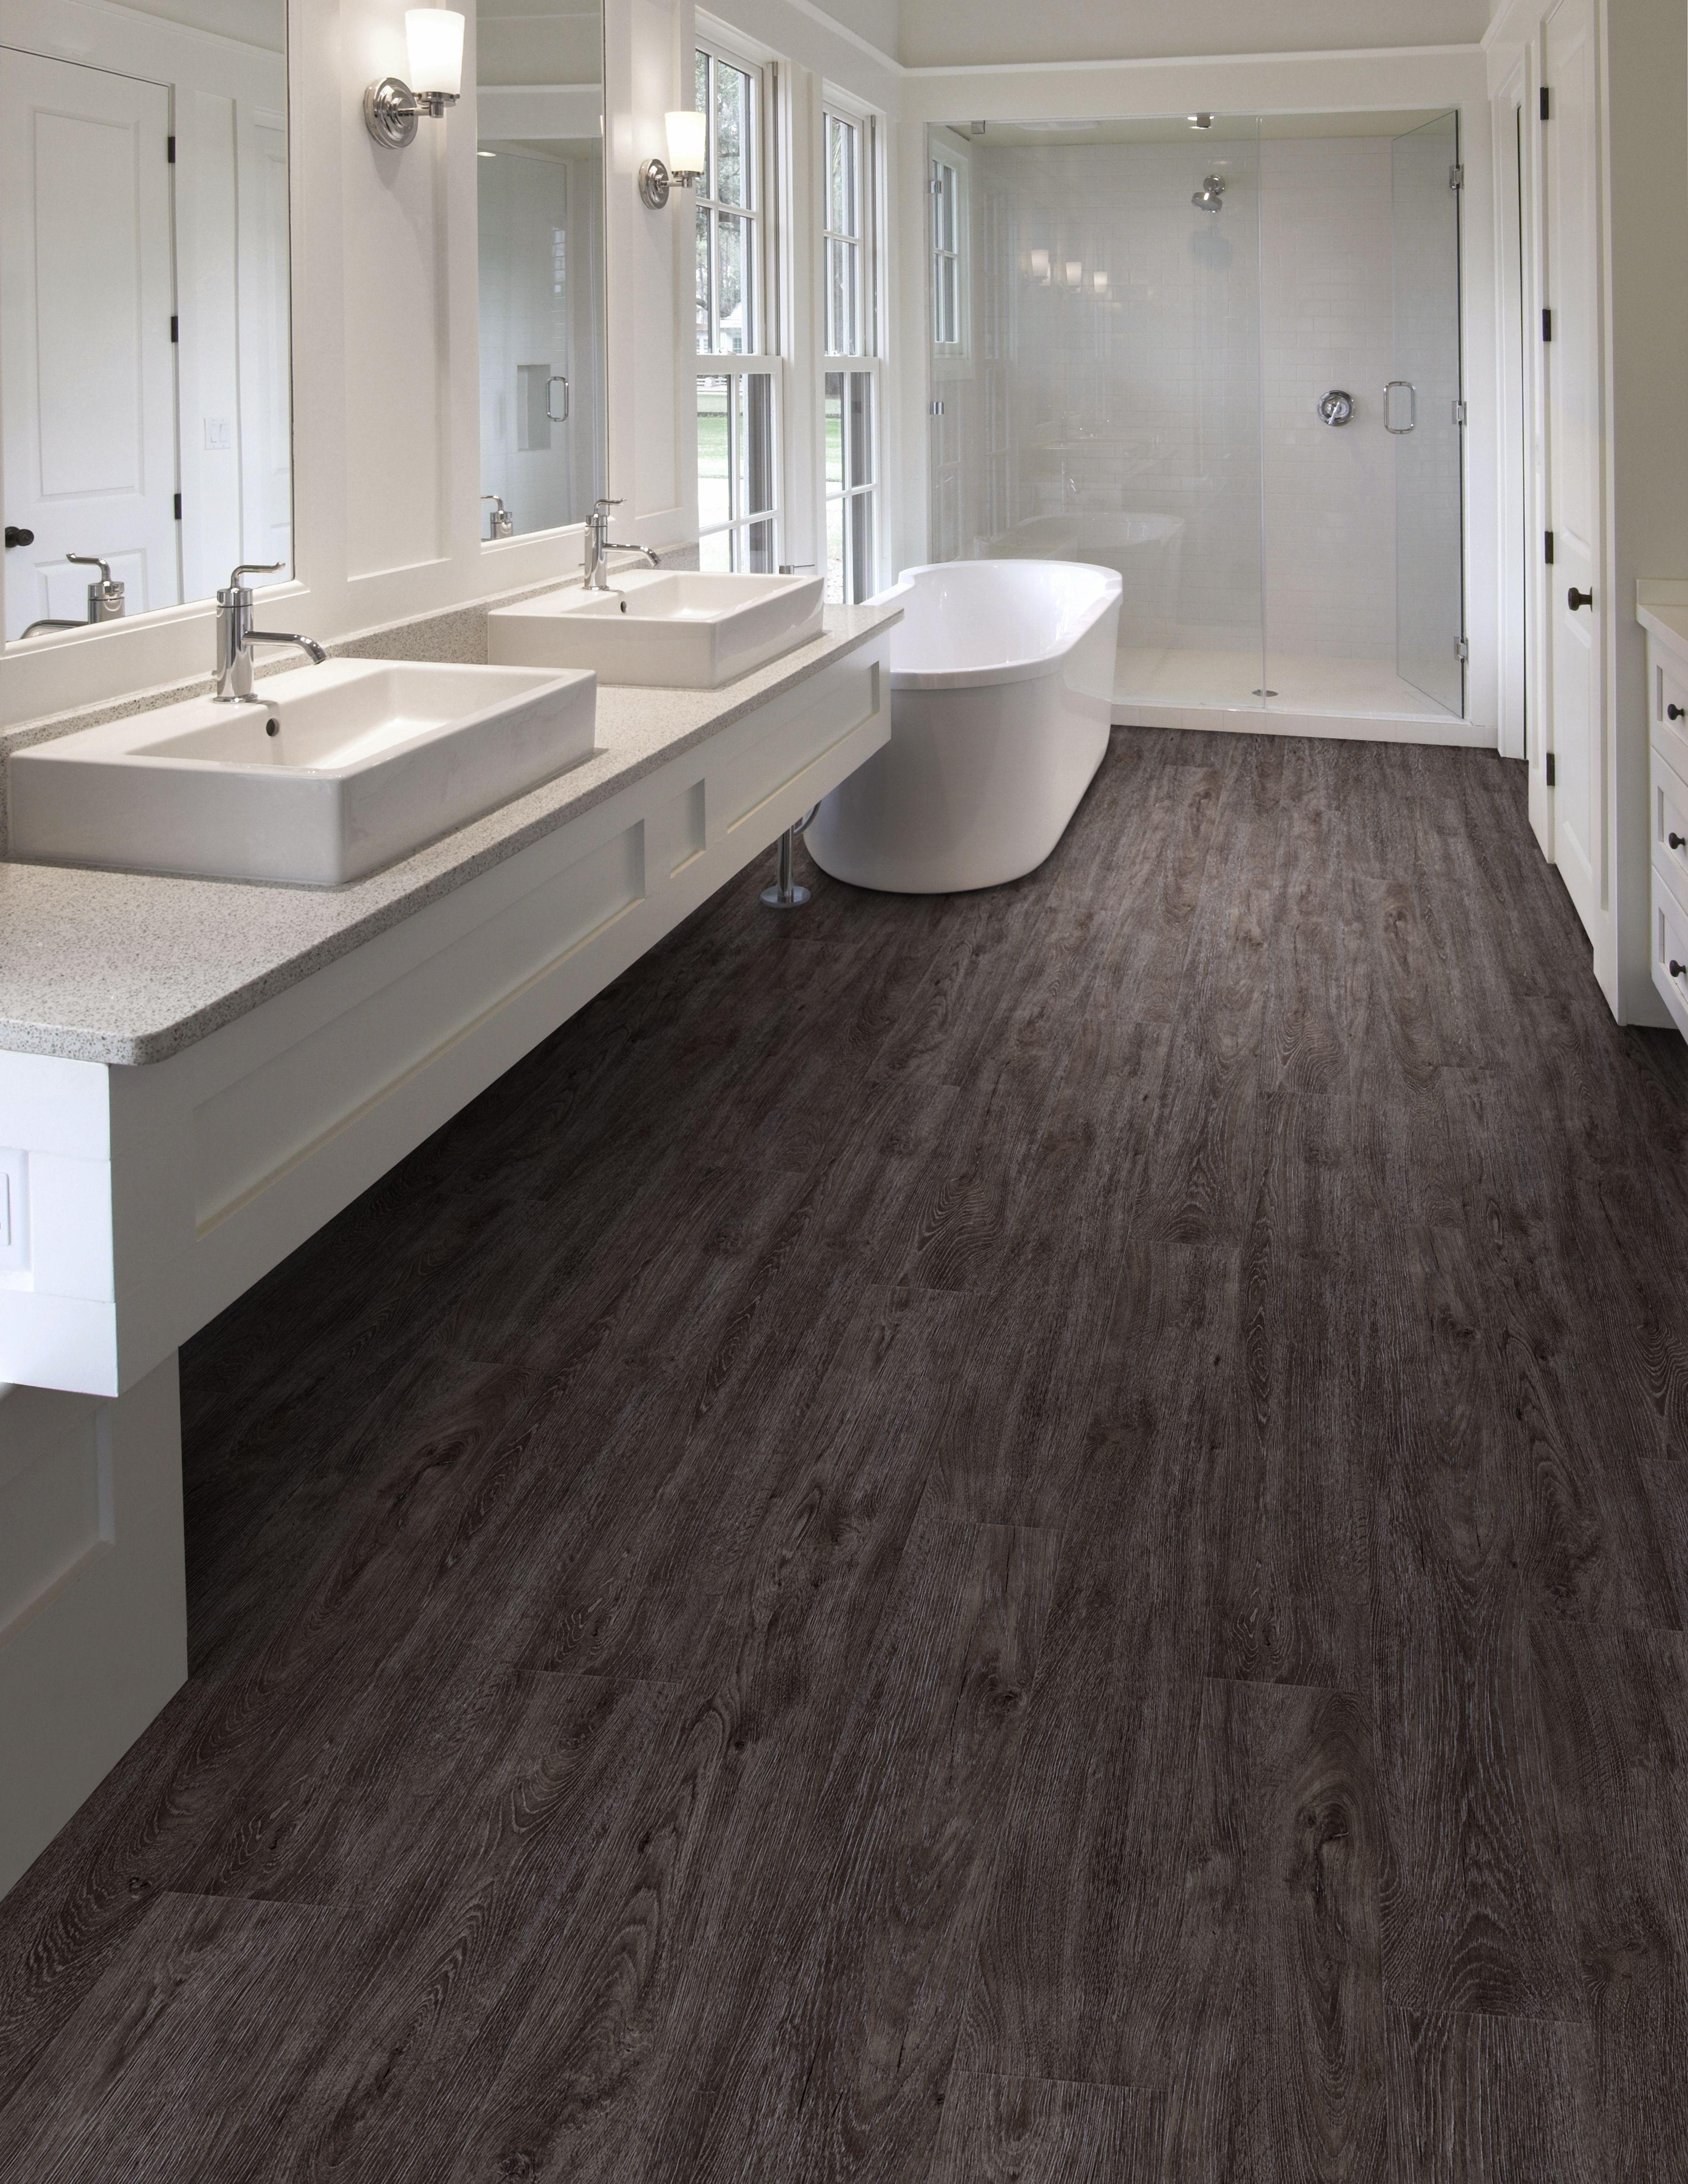 Pin By Ejwelchco On Tarkett Commercial Bathroom Vinyl Luxury Vinyl Tile Best Bathroom Flooring